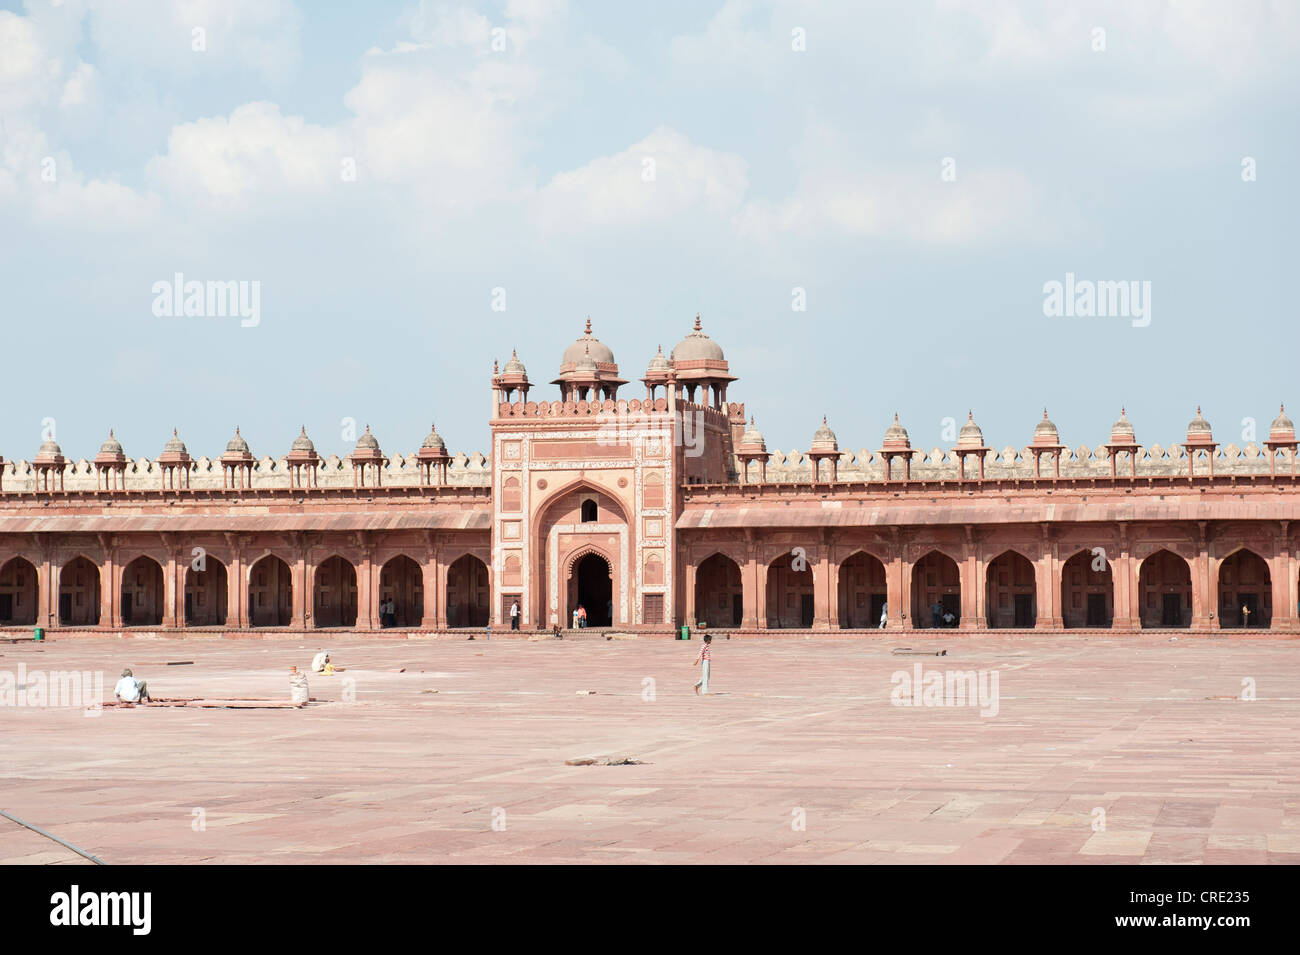 Mosque, Iwan and gateway, Jama Masjid Mosque, Fatehpur Sikri, Uttar Pradesh, India, South Asia, Asia - Stock Image